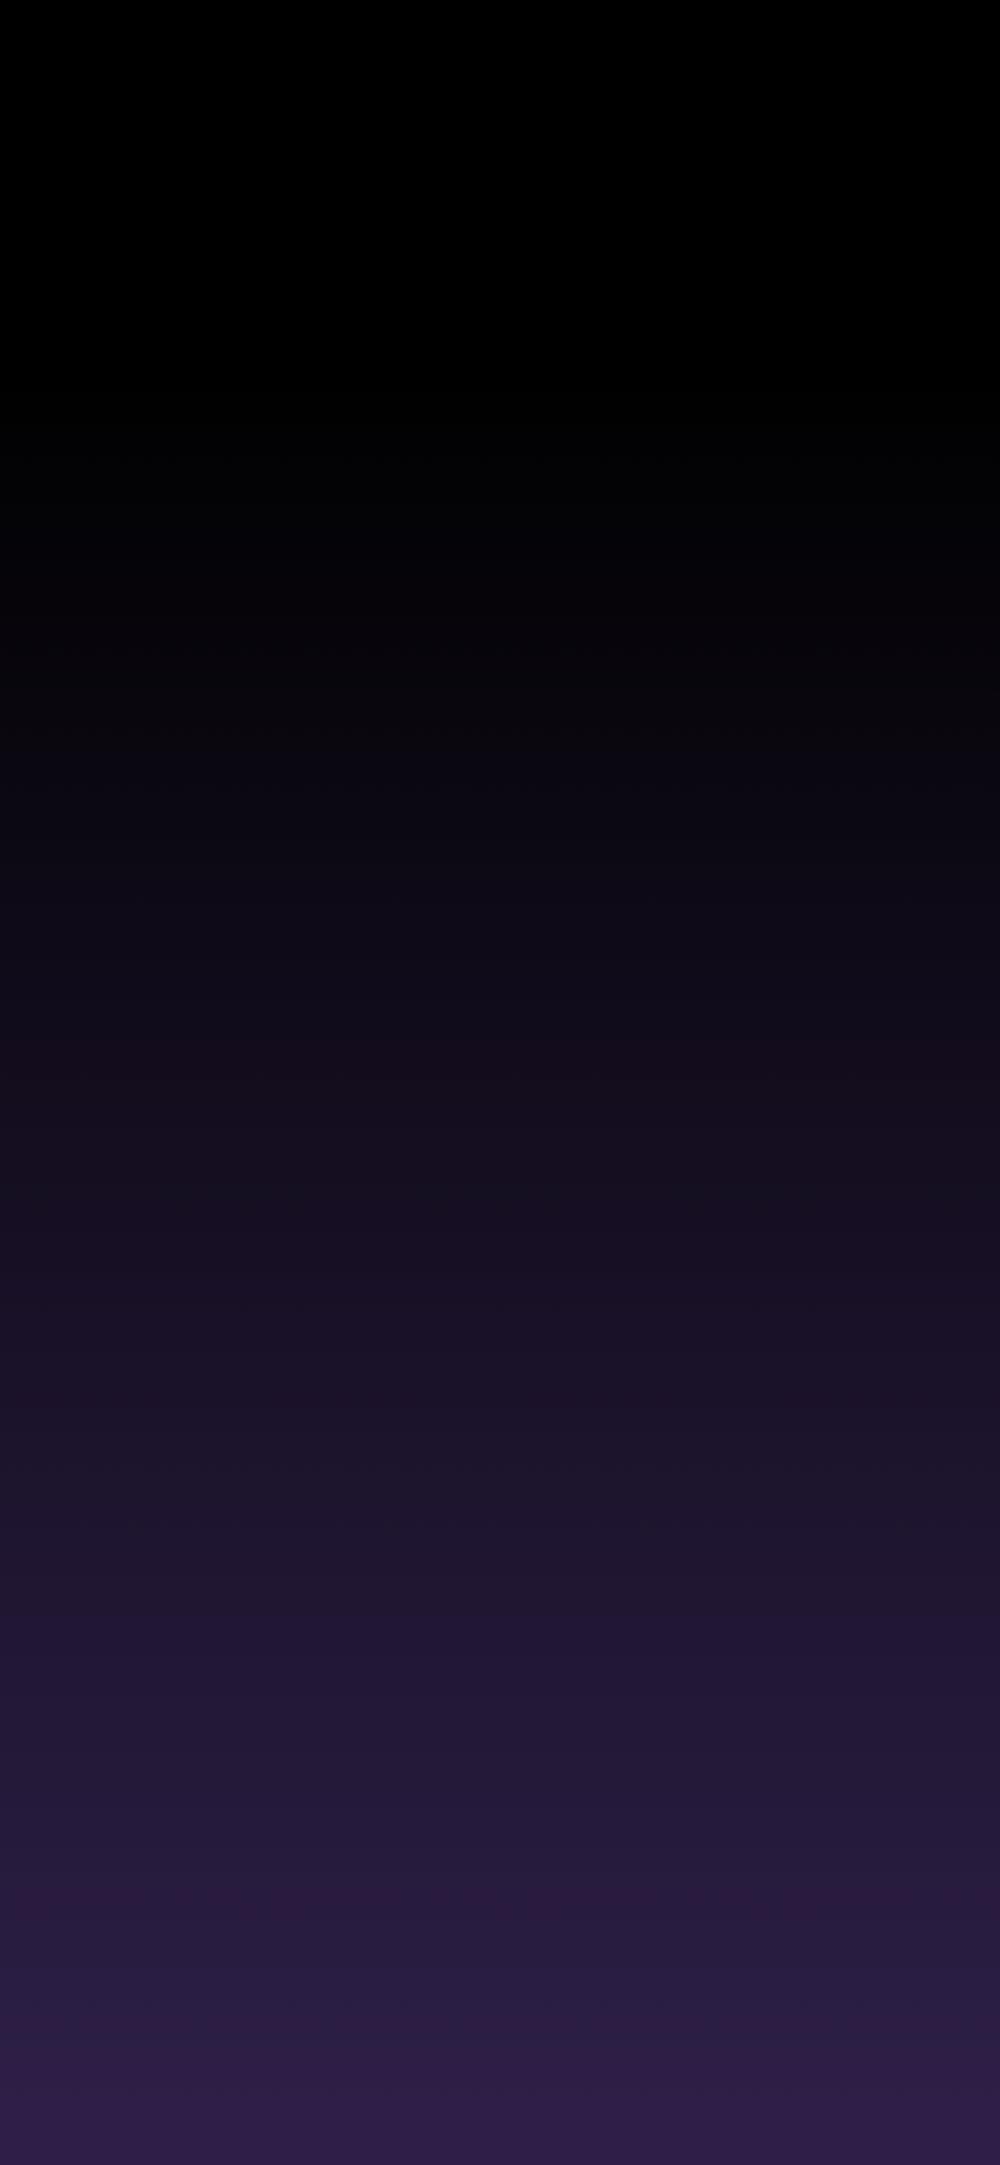 iPhone X Wallpaper Midnight Purple